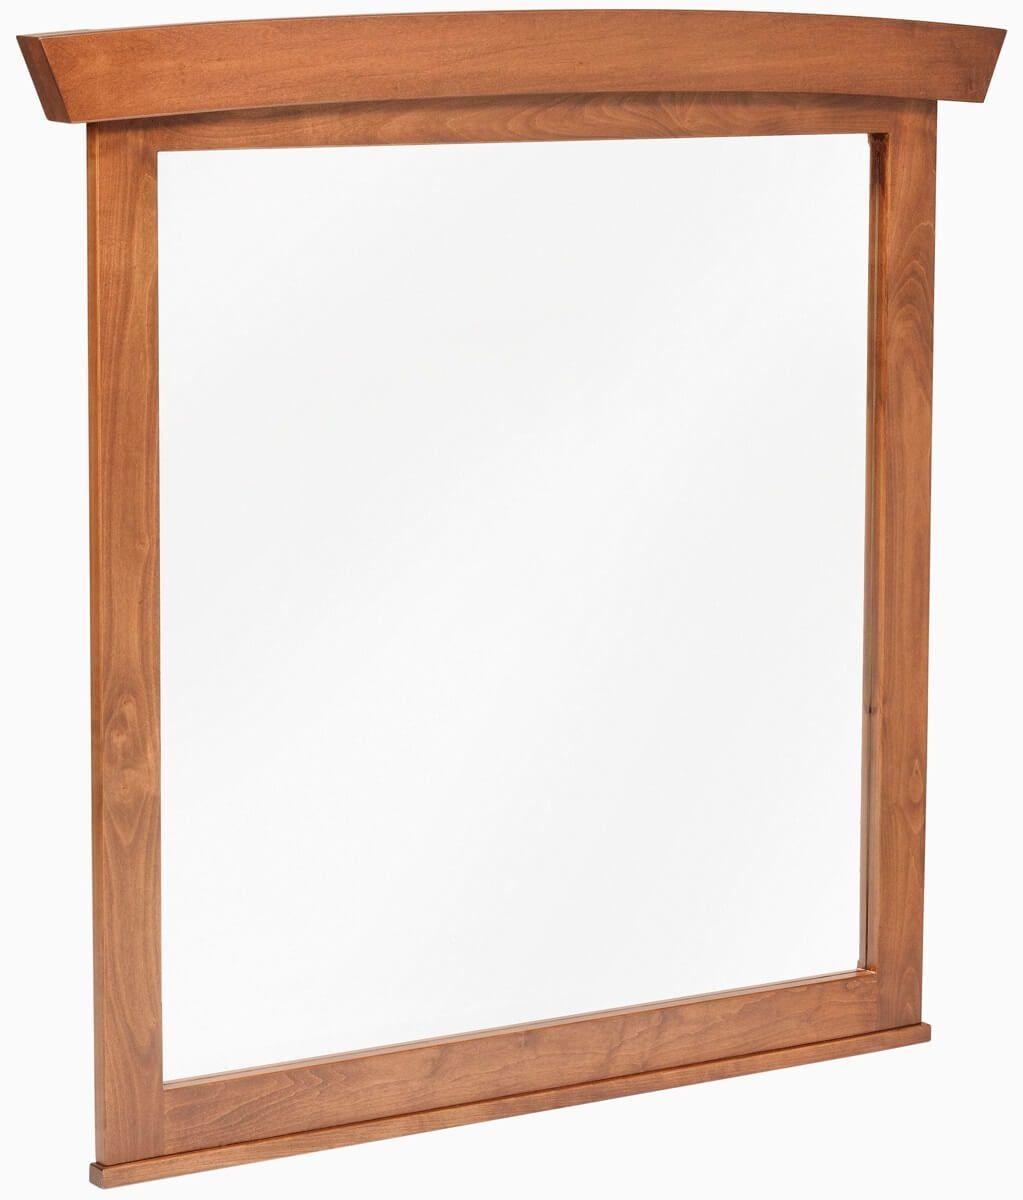 Optional Beveled Mirror